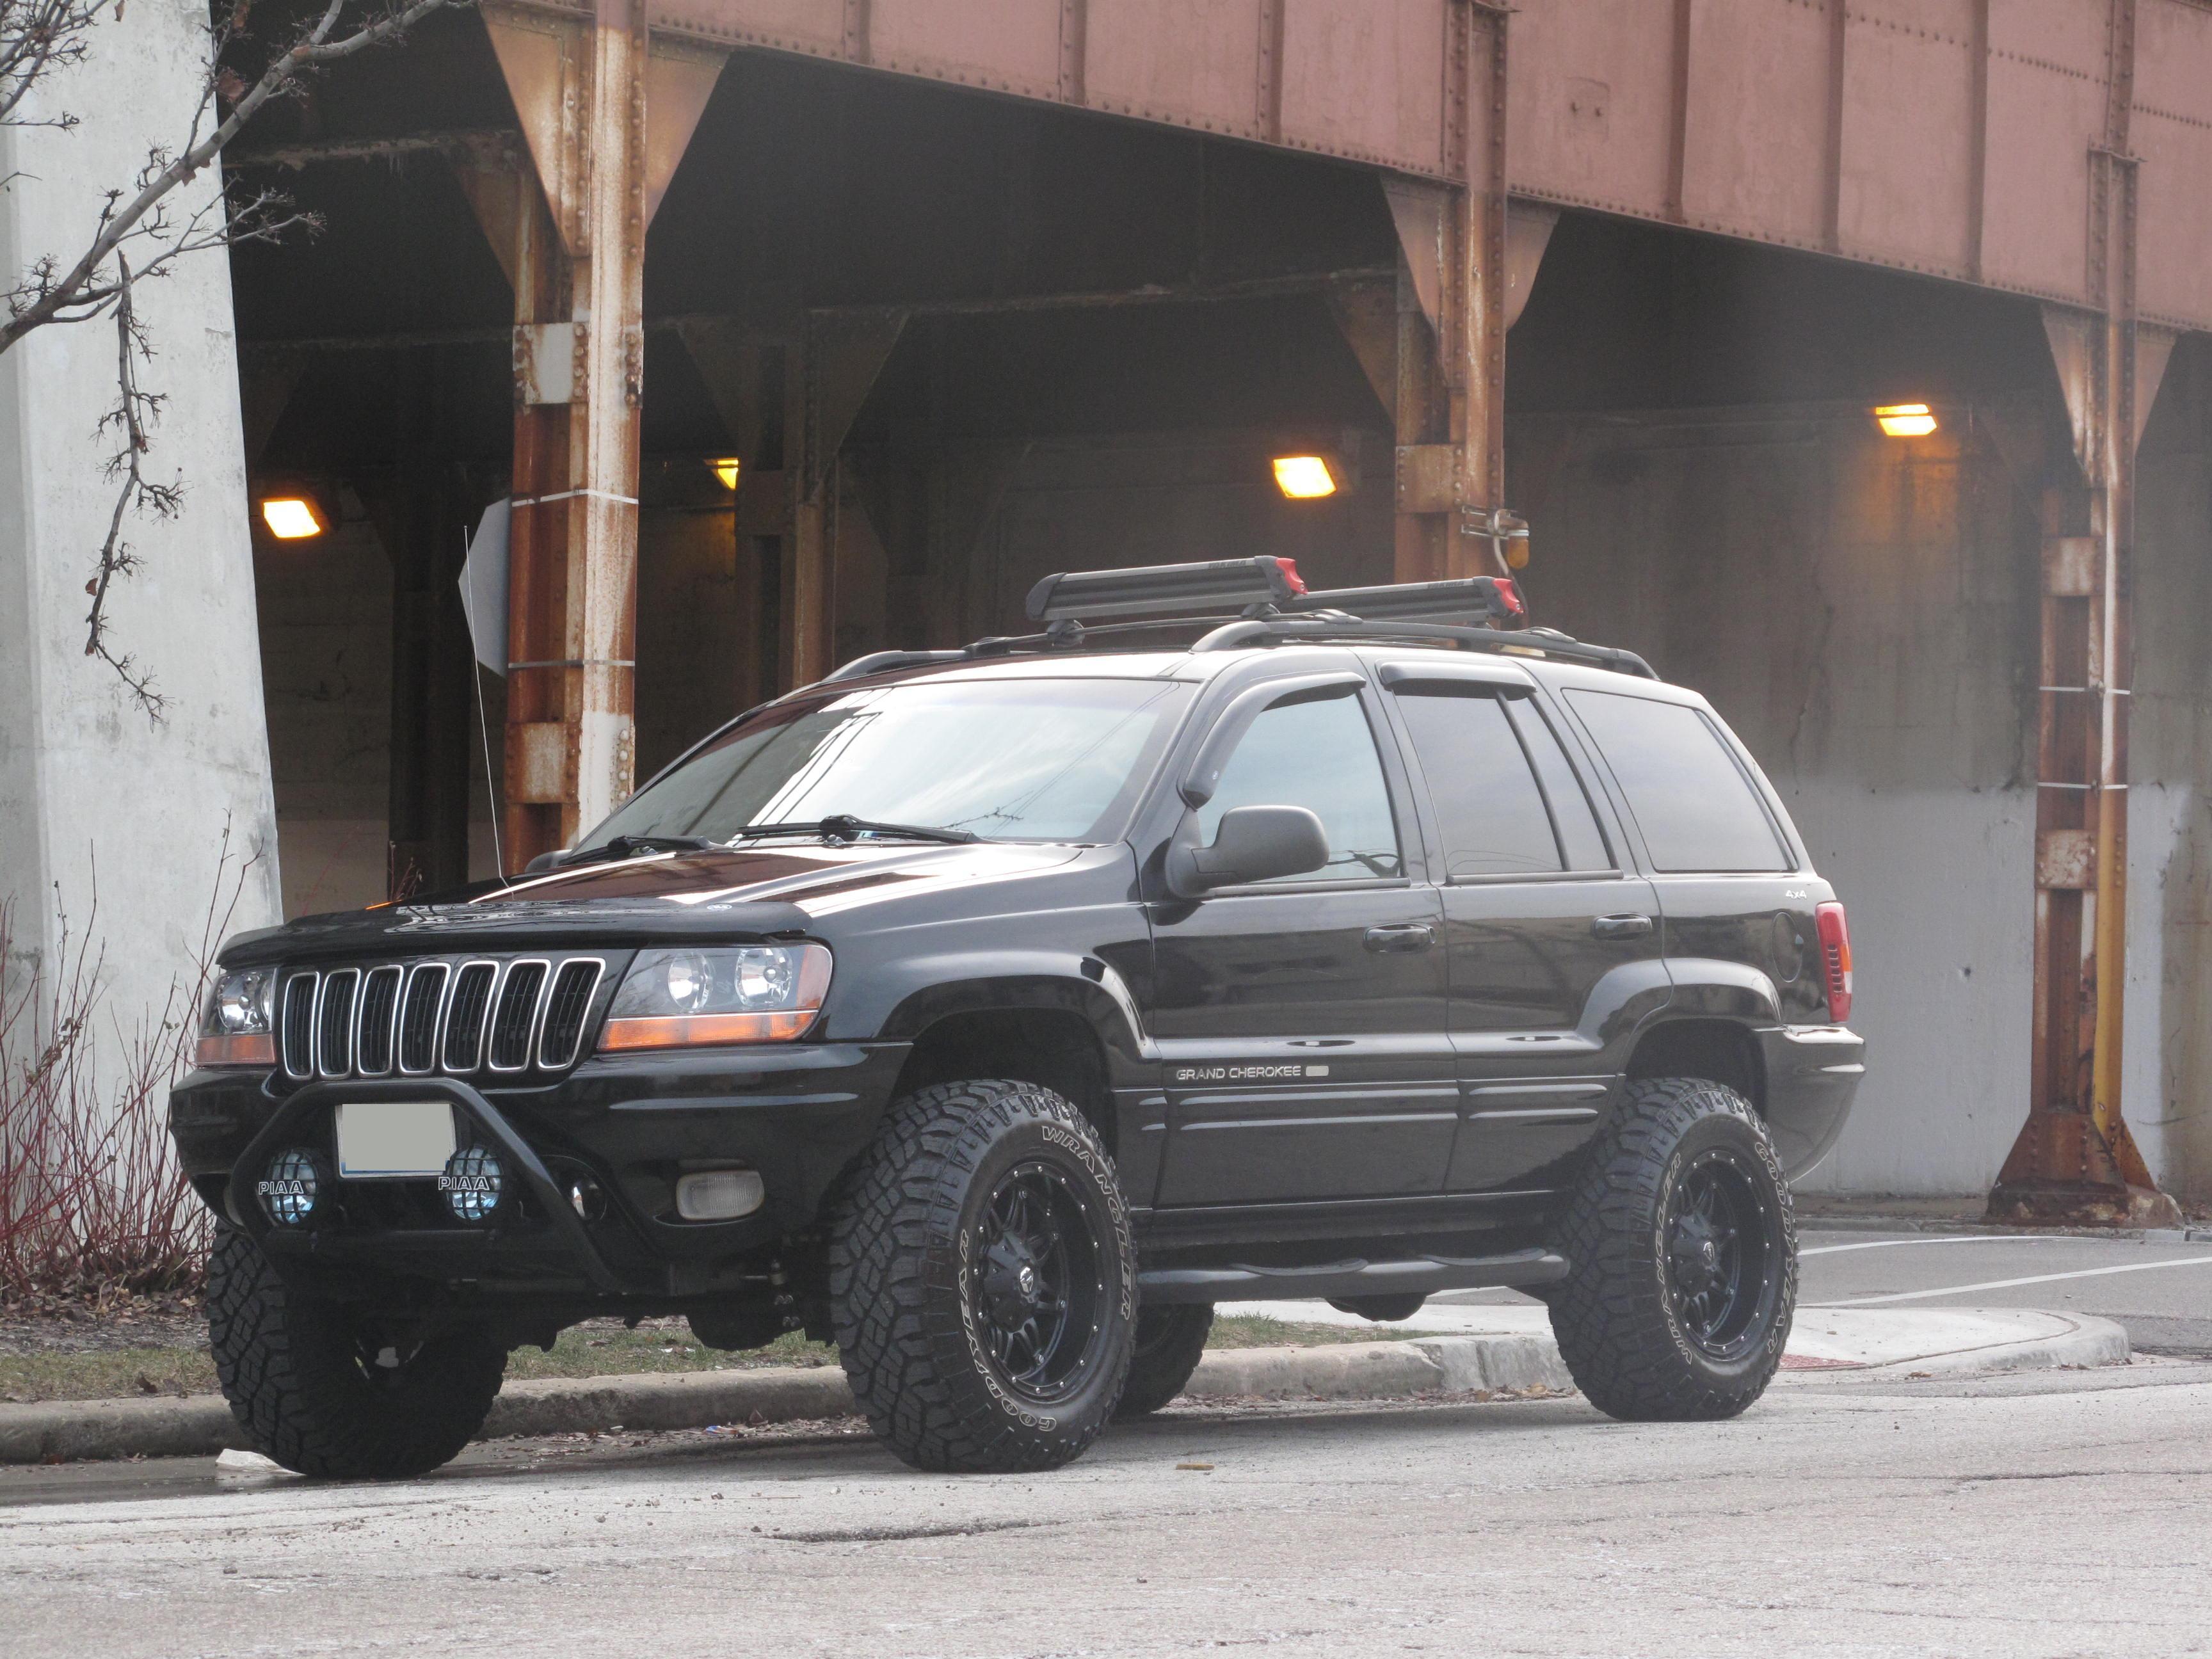 2001 Jeep Grand Cherokee #15 Jeep Grand Cherokee #15